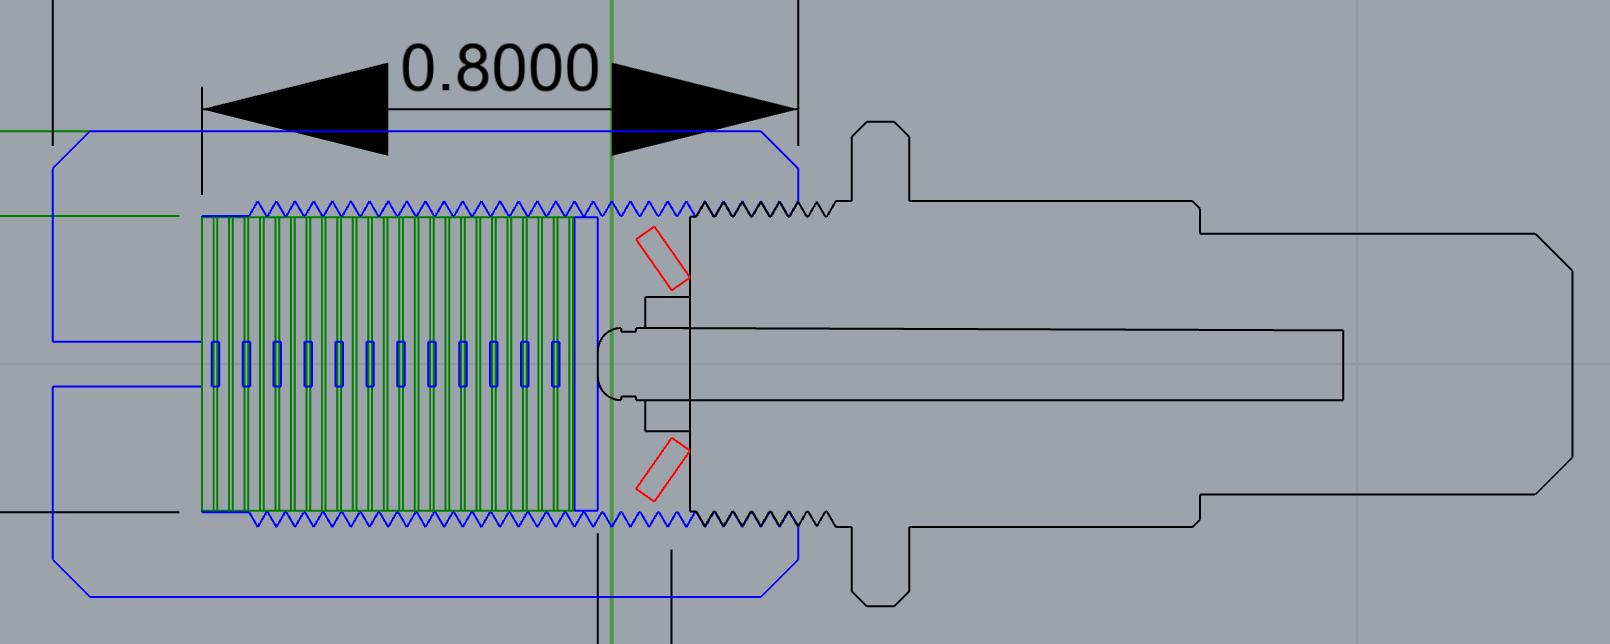 Sam Calisch Op Amp Led Driver Problem Electrical Engineering Stack Exchange Oscillating Knife Sketches Using Rolands Drag Module